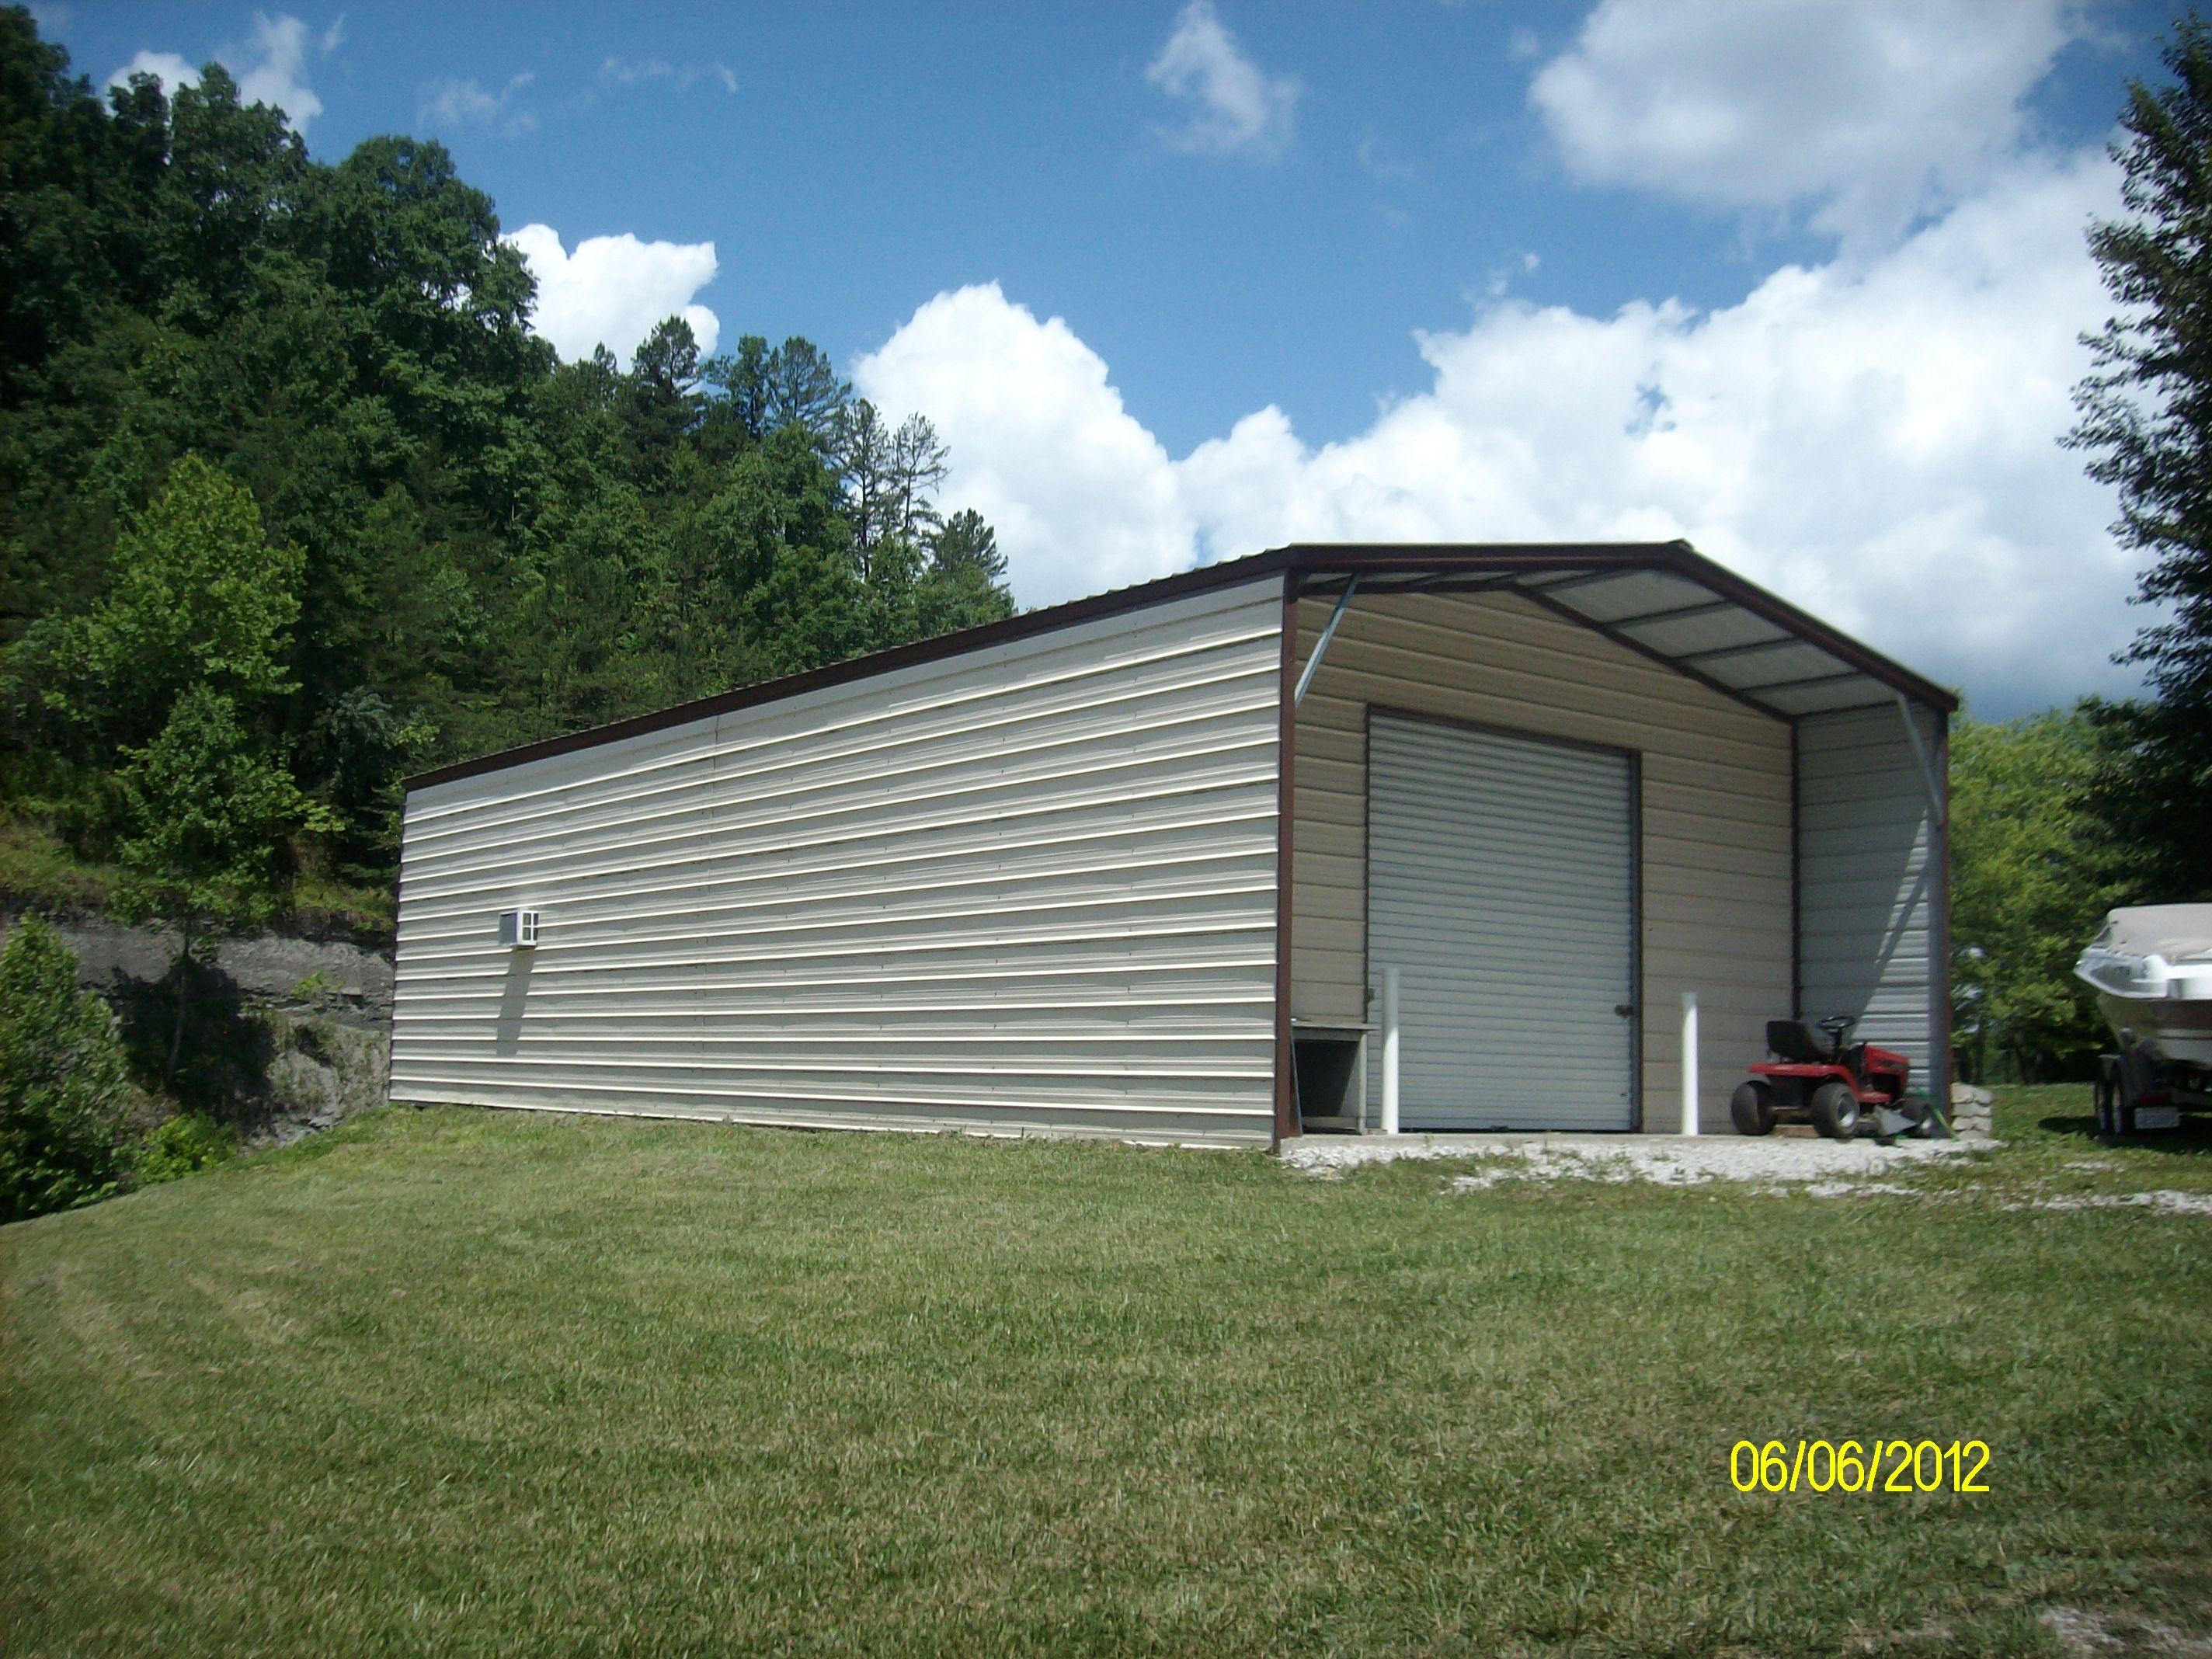 9 x 8 garage doorSouthern Garage Packages